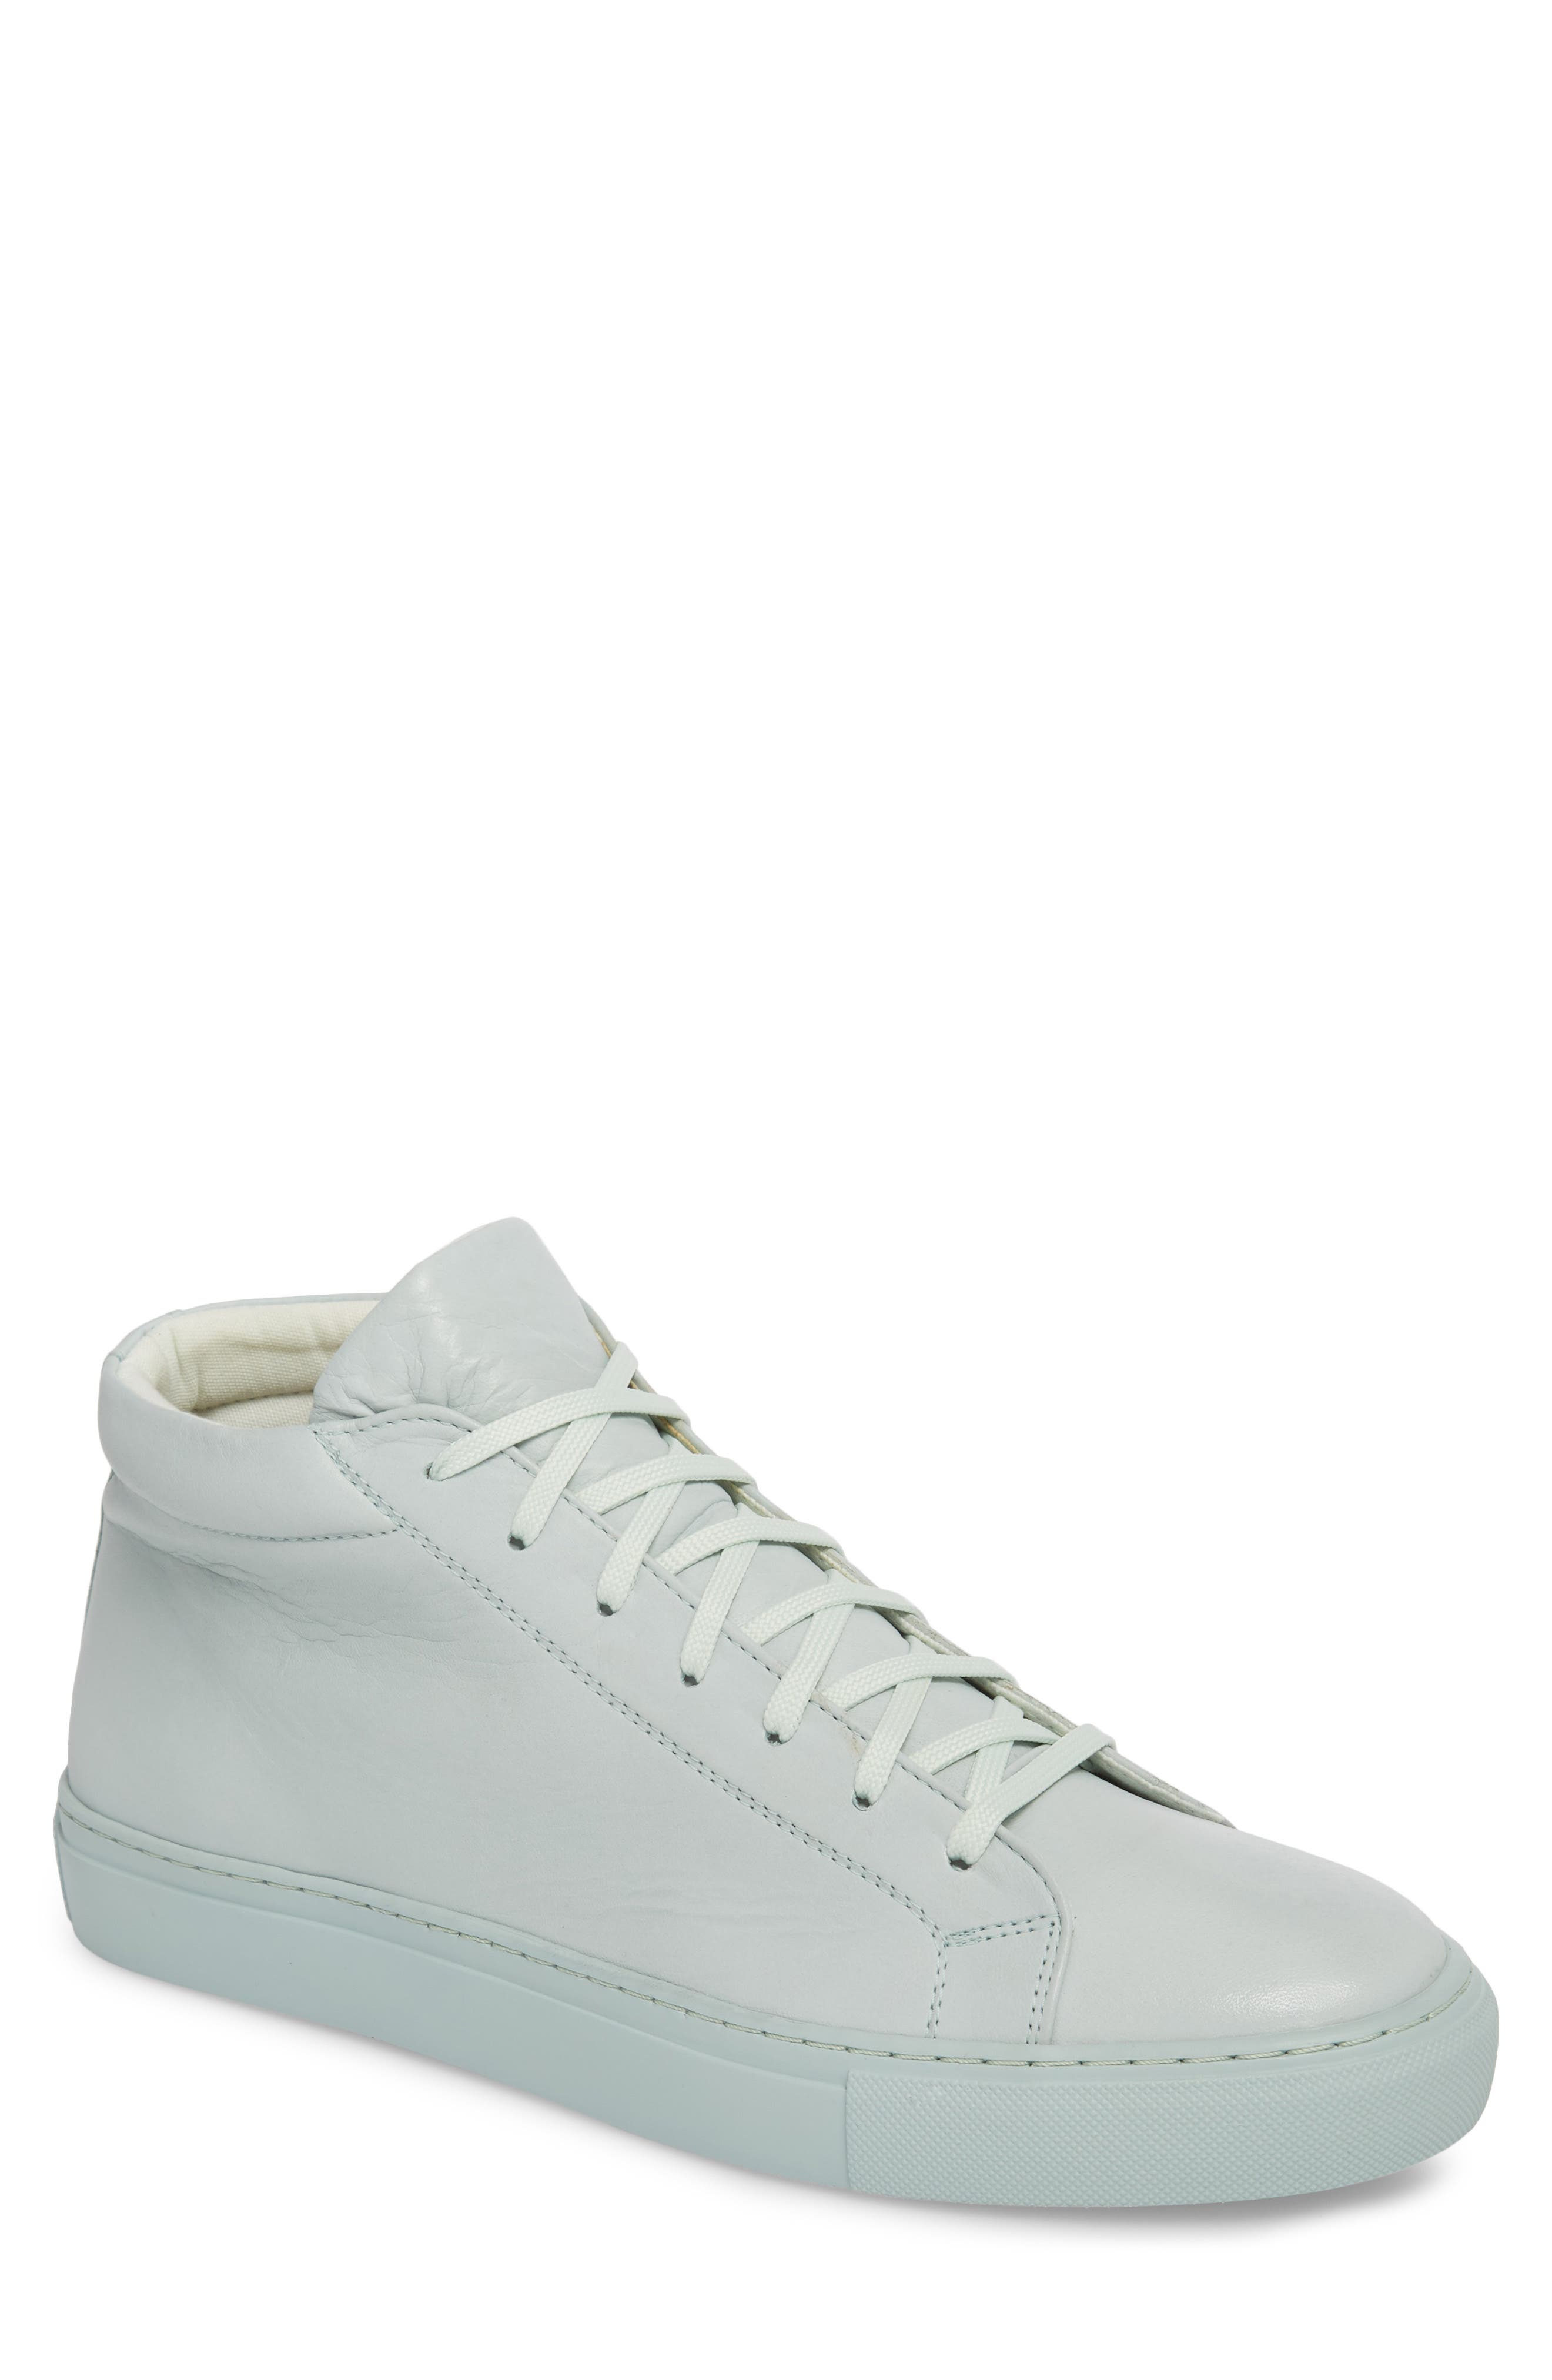 Lexington Mid Top Sneaker,                             Main thumbnail 1, color,